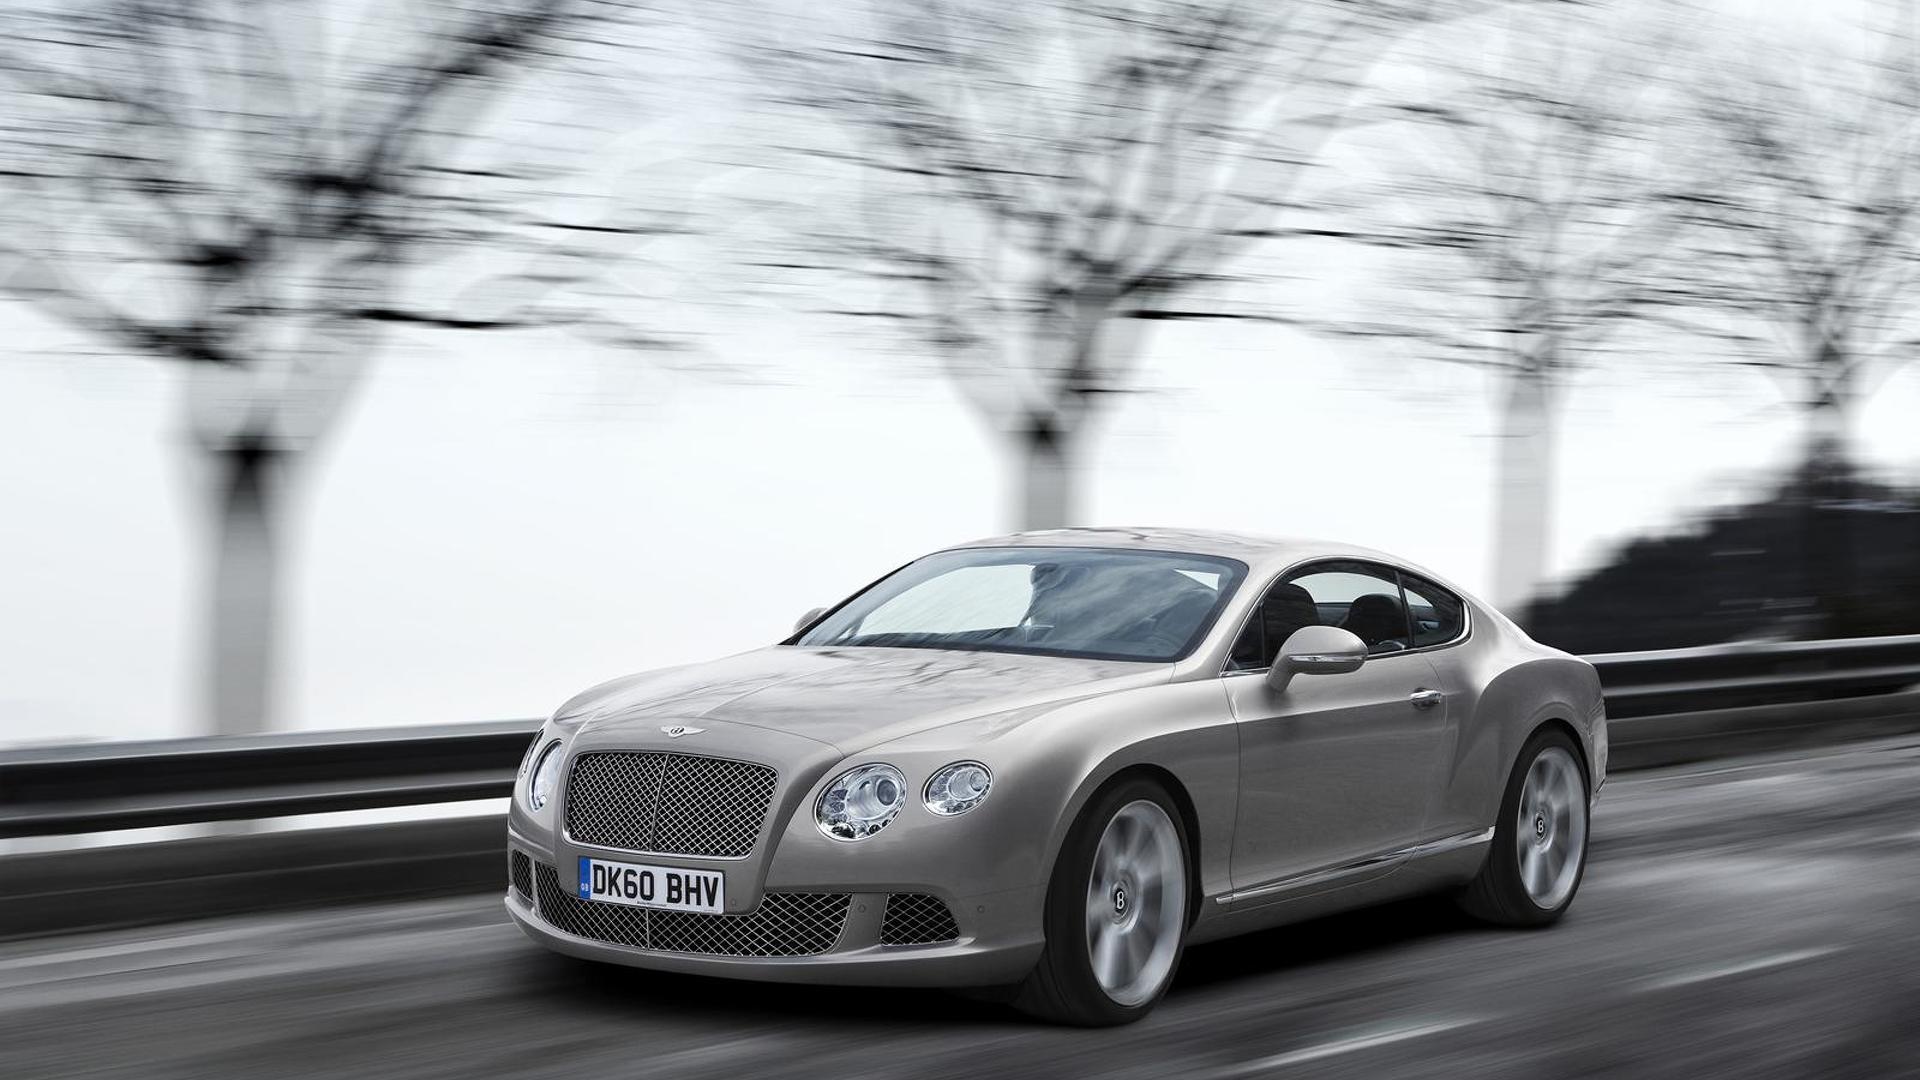 Bentley partnering with Audi on new 4.0 liter V8 engine